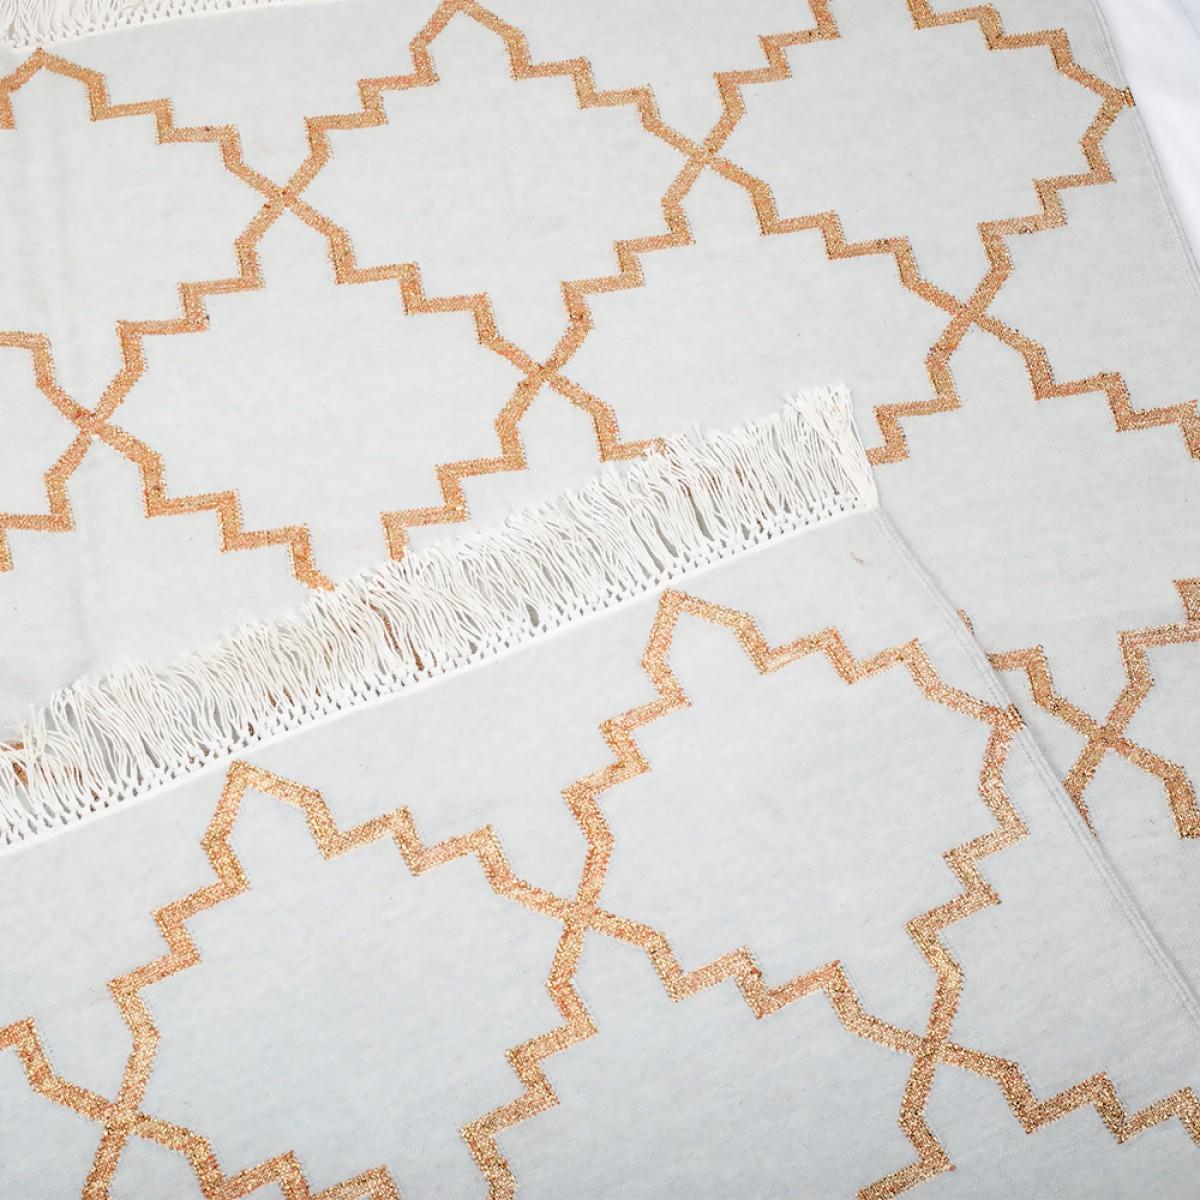 Cotton Floor Rugs - Pale Grey & Gold Zari